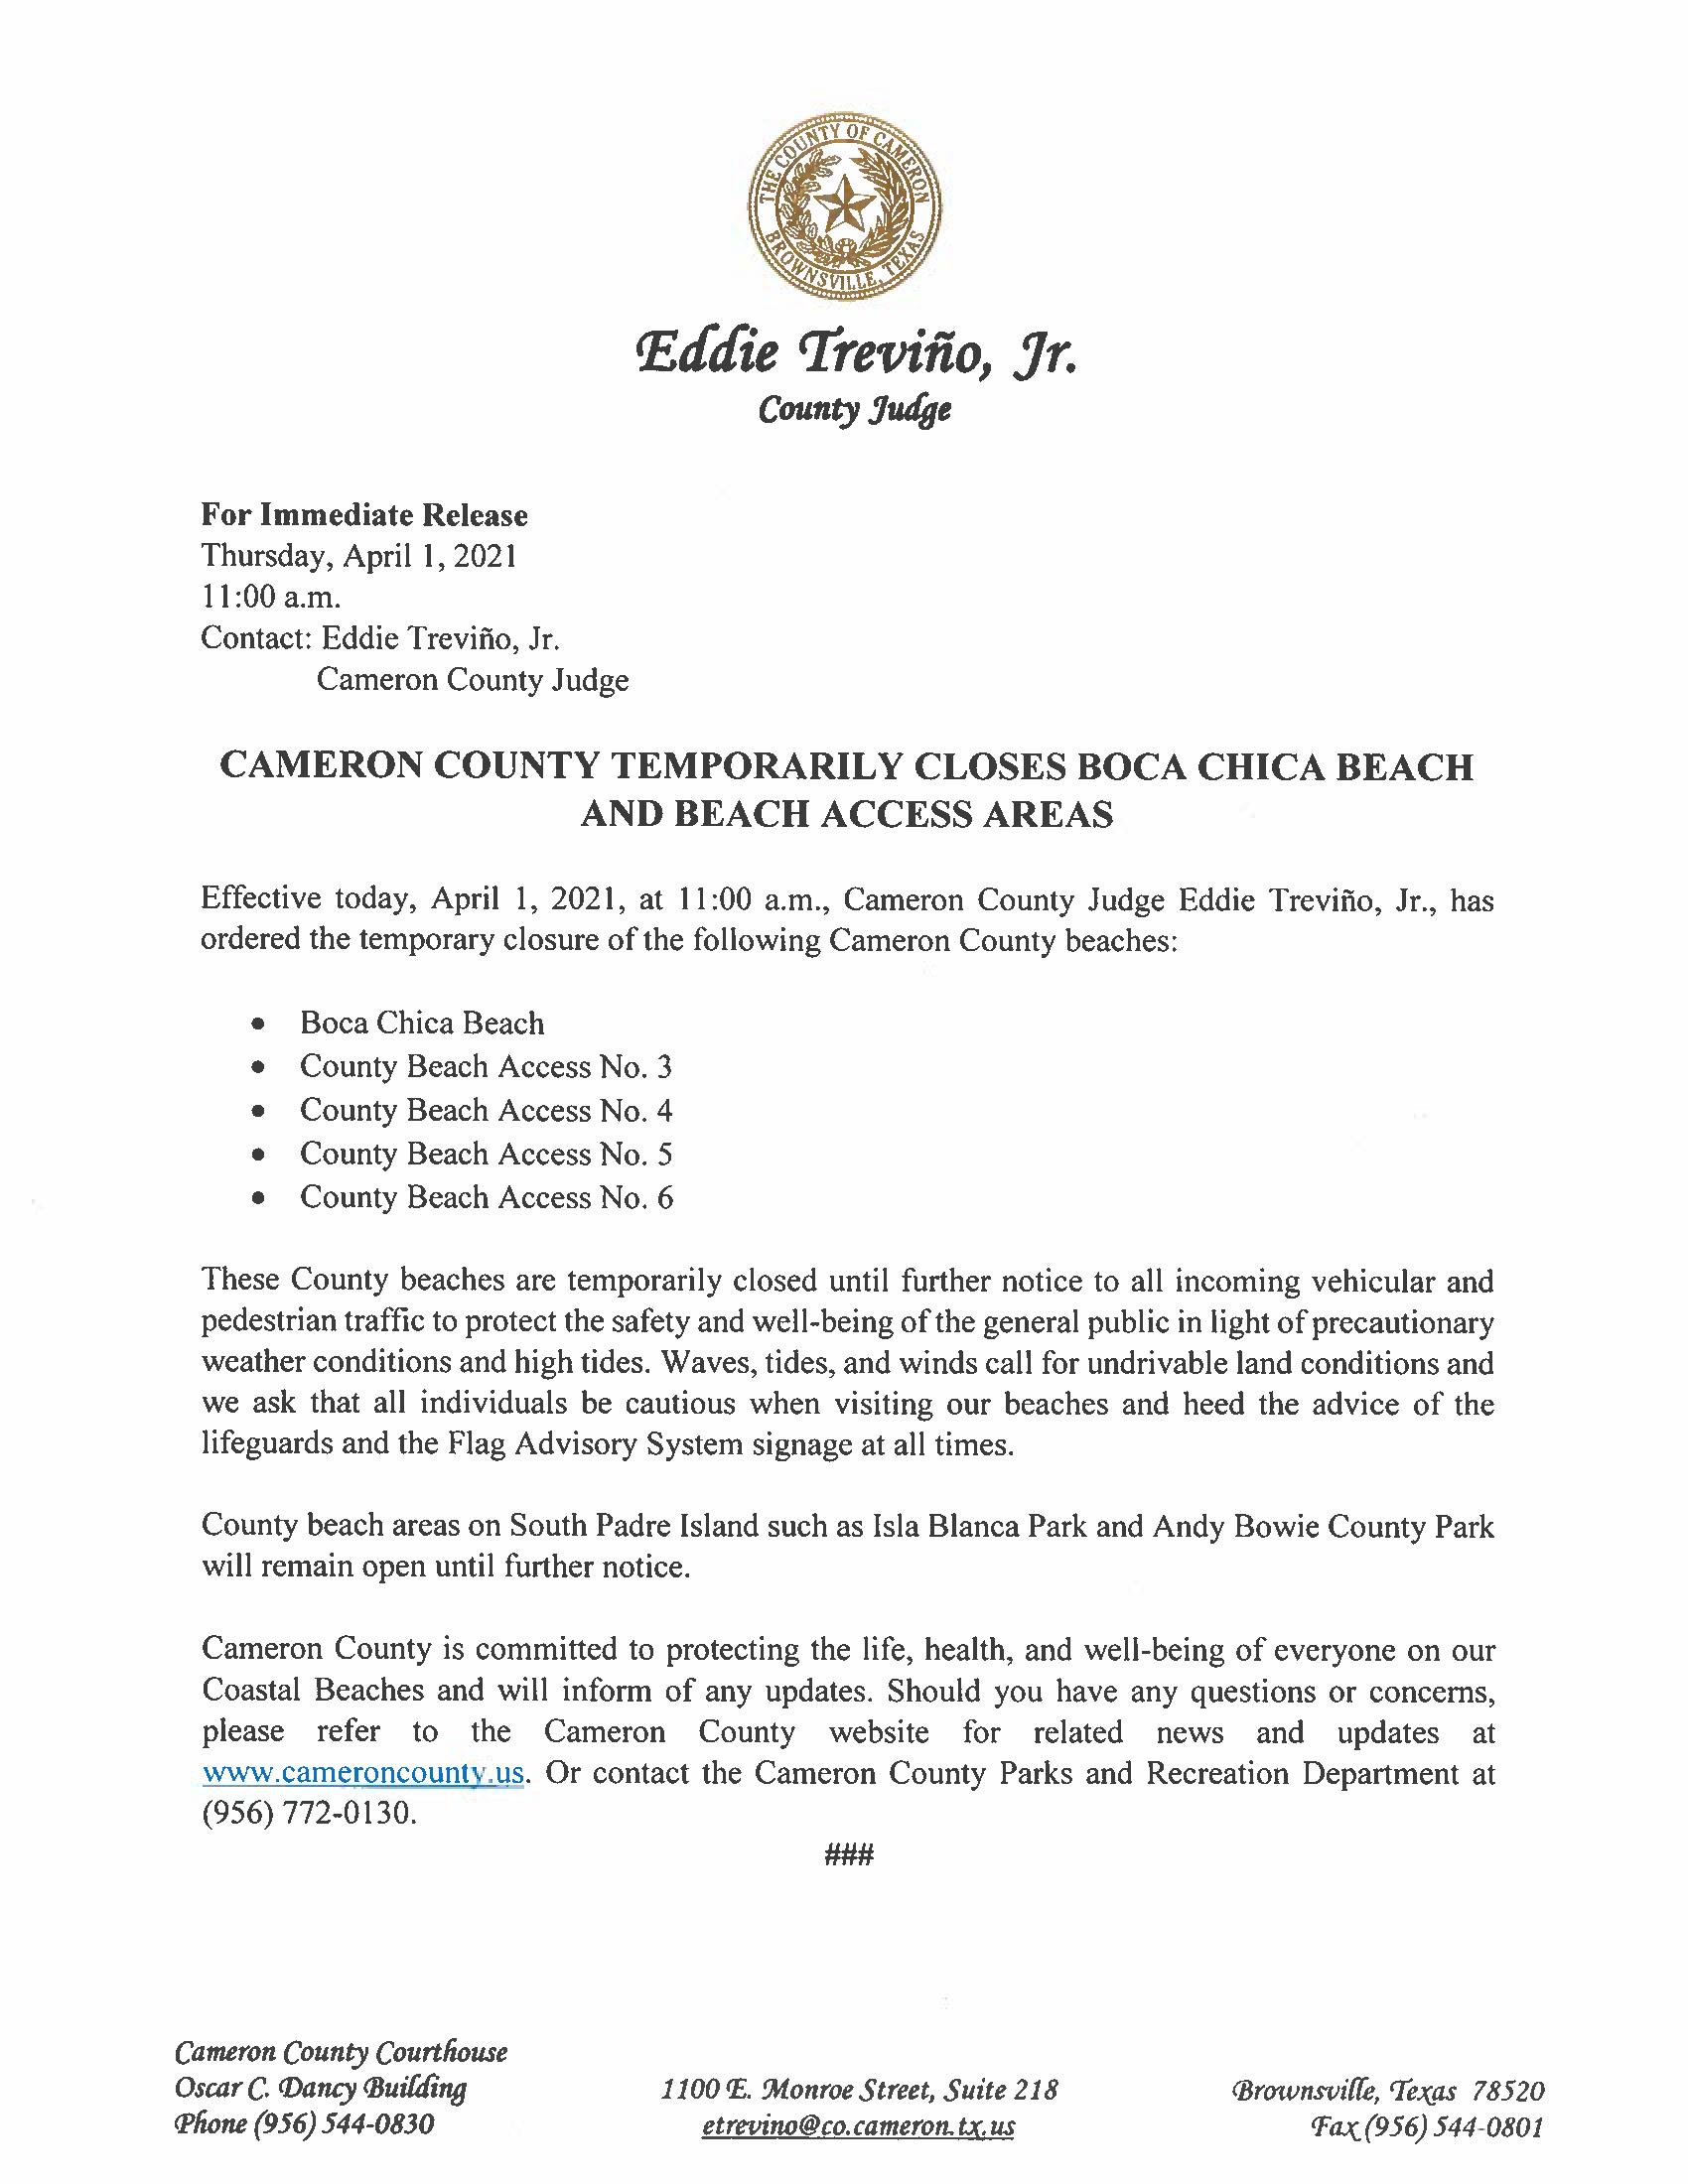 4.1.21 Cameron County Temporarily Closes Boca Chica Beach And Beach Access Areas